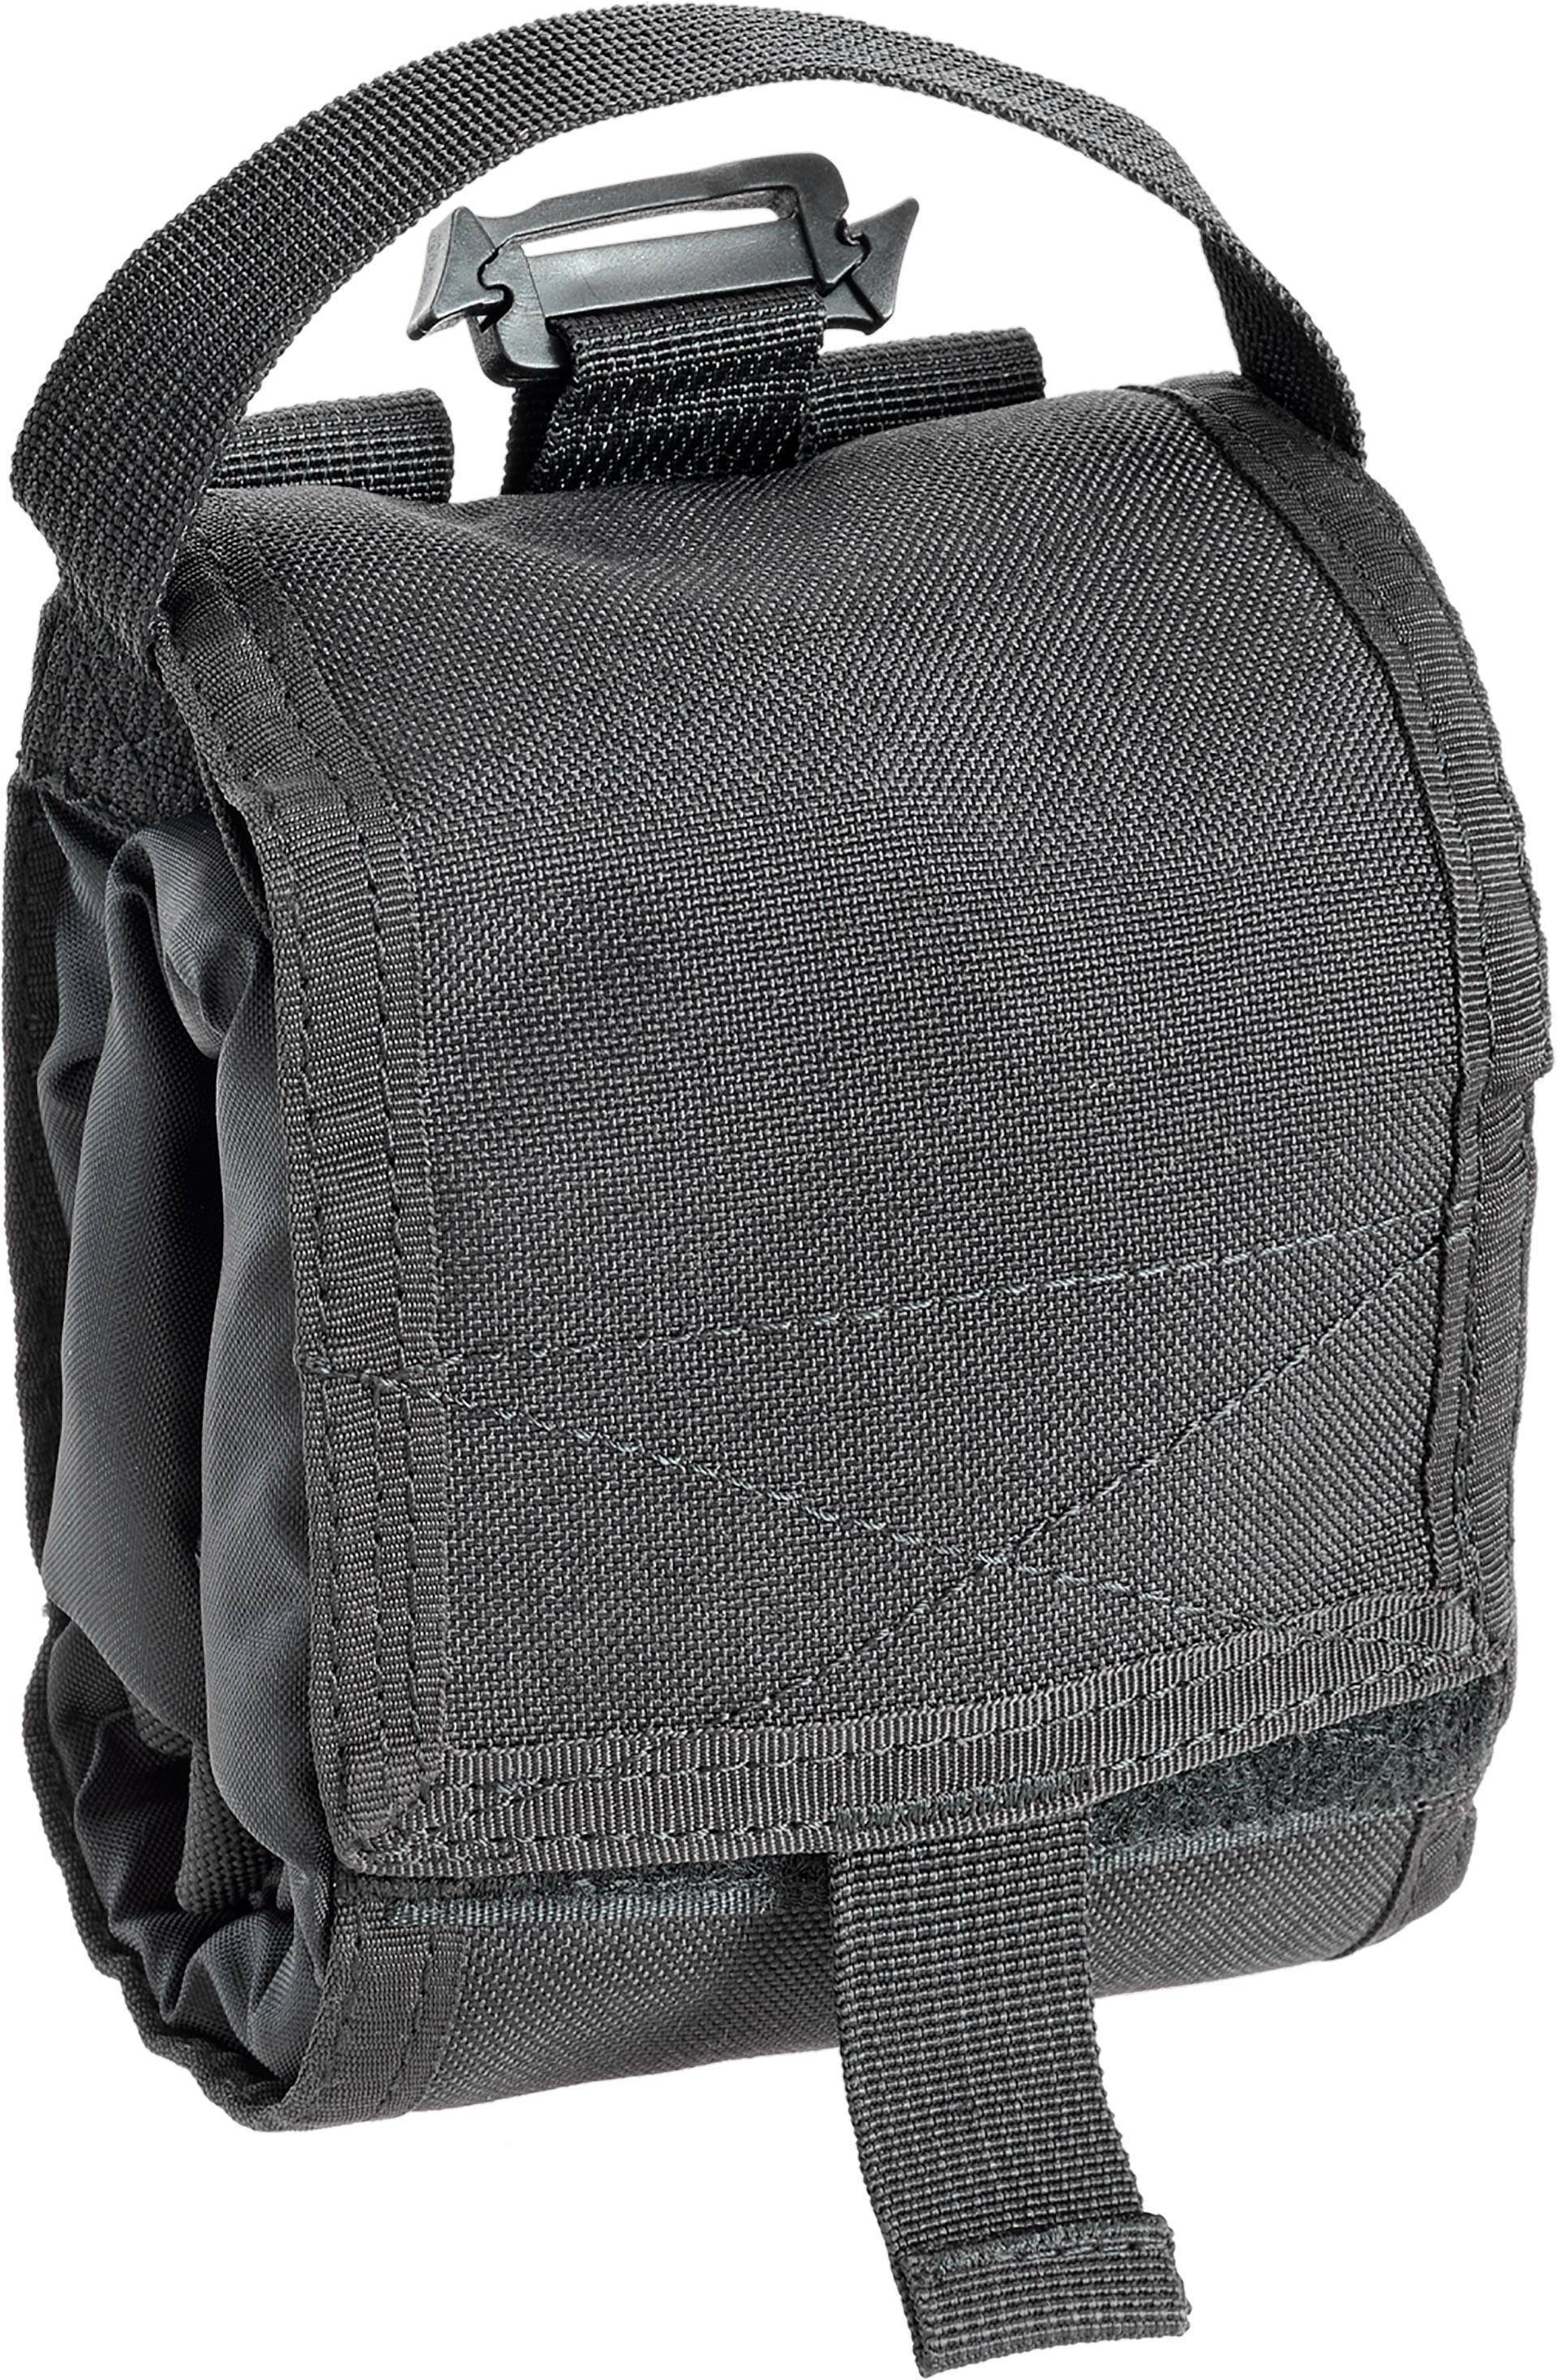 Складной рюкзак Defcon 5 RollyPoly Pack Black